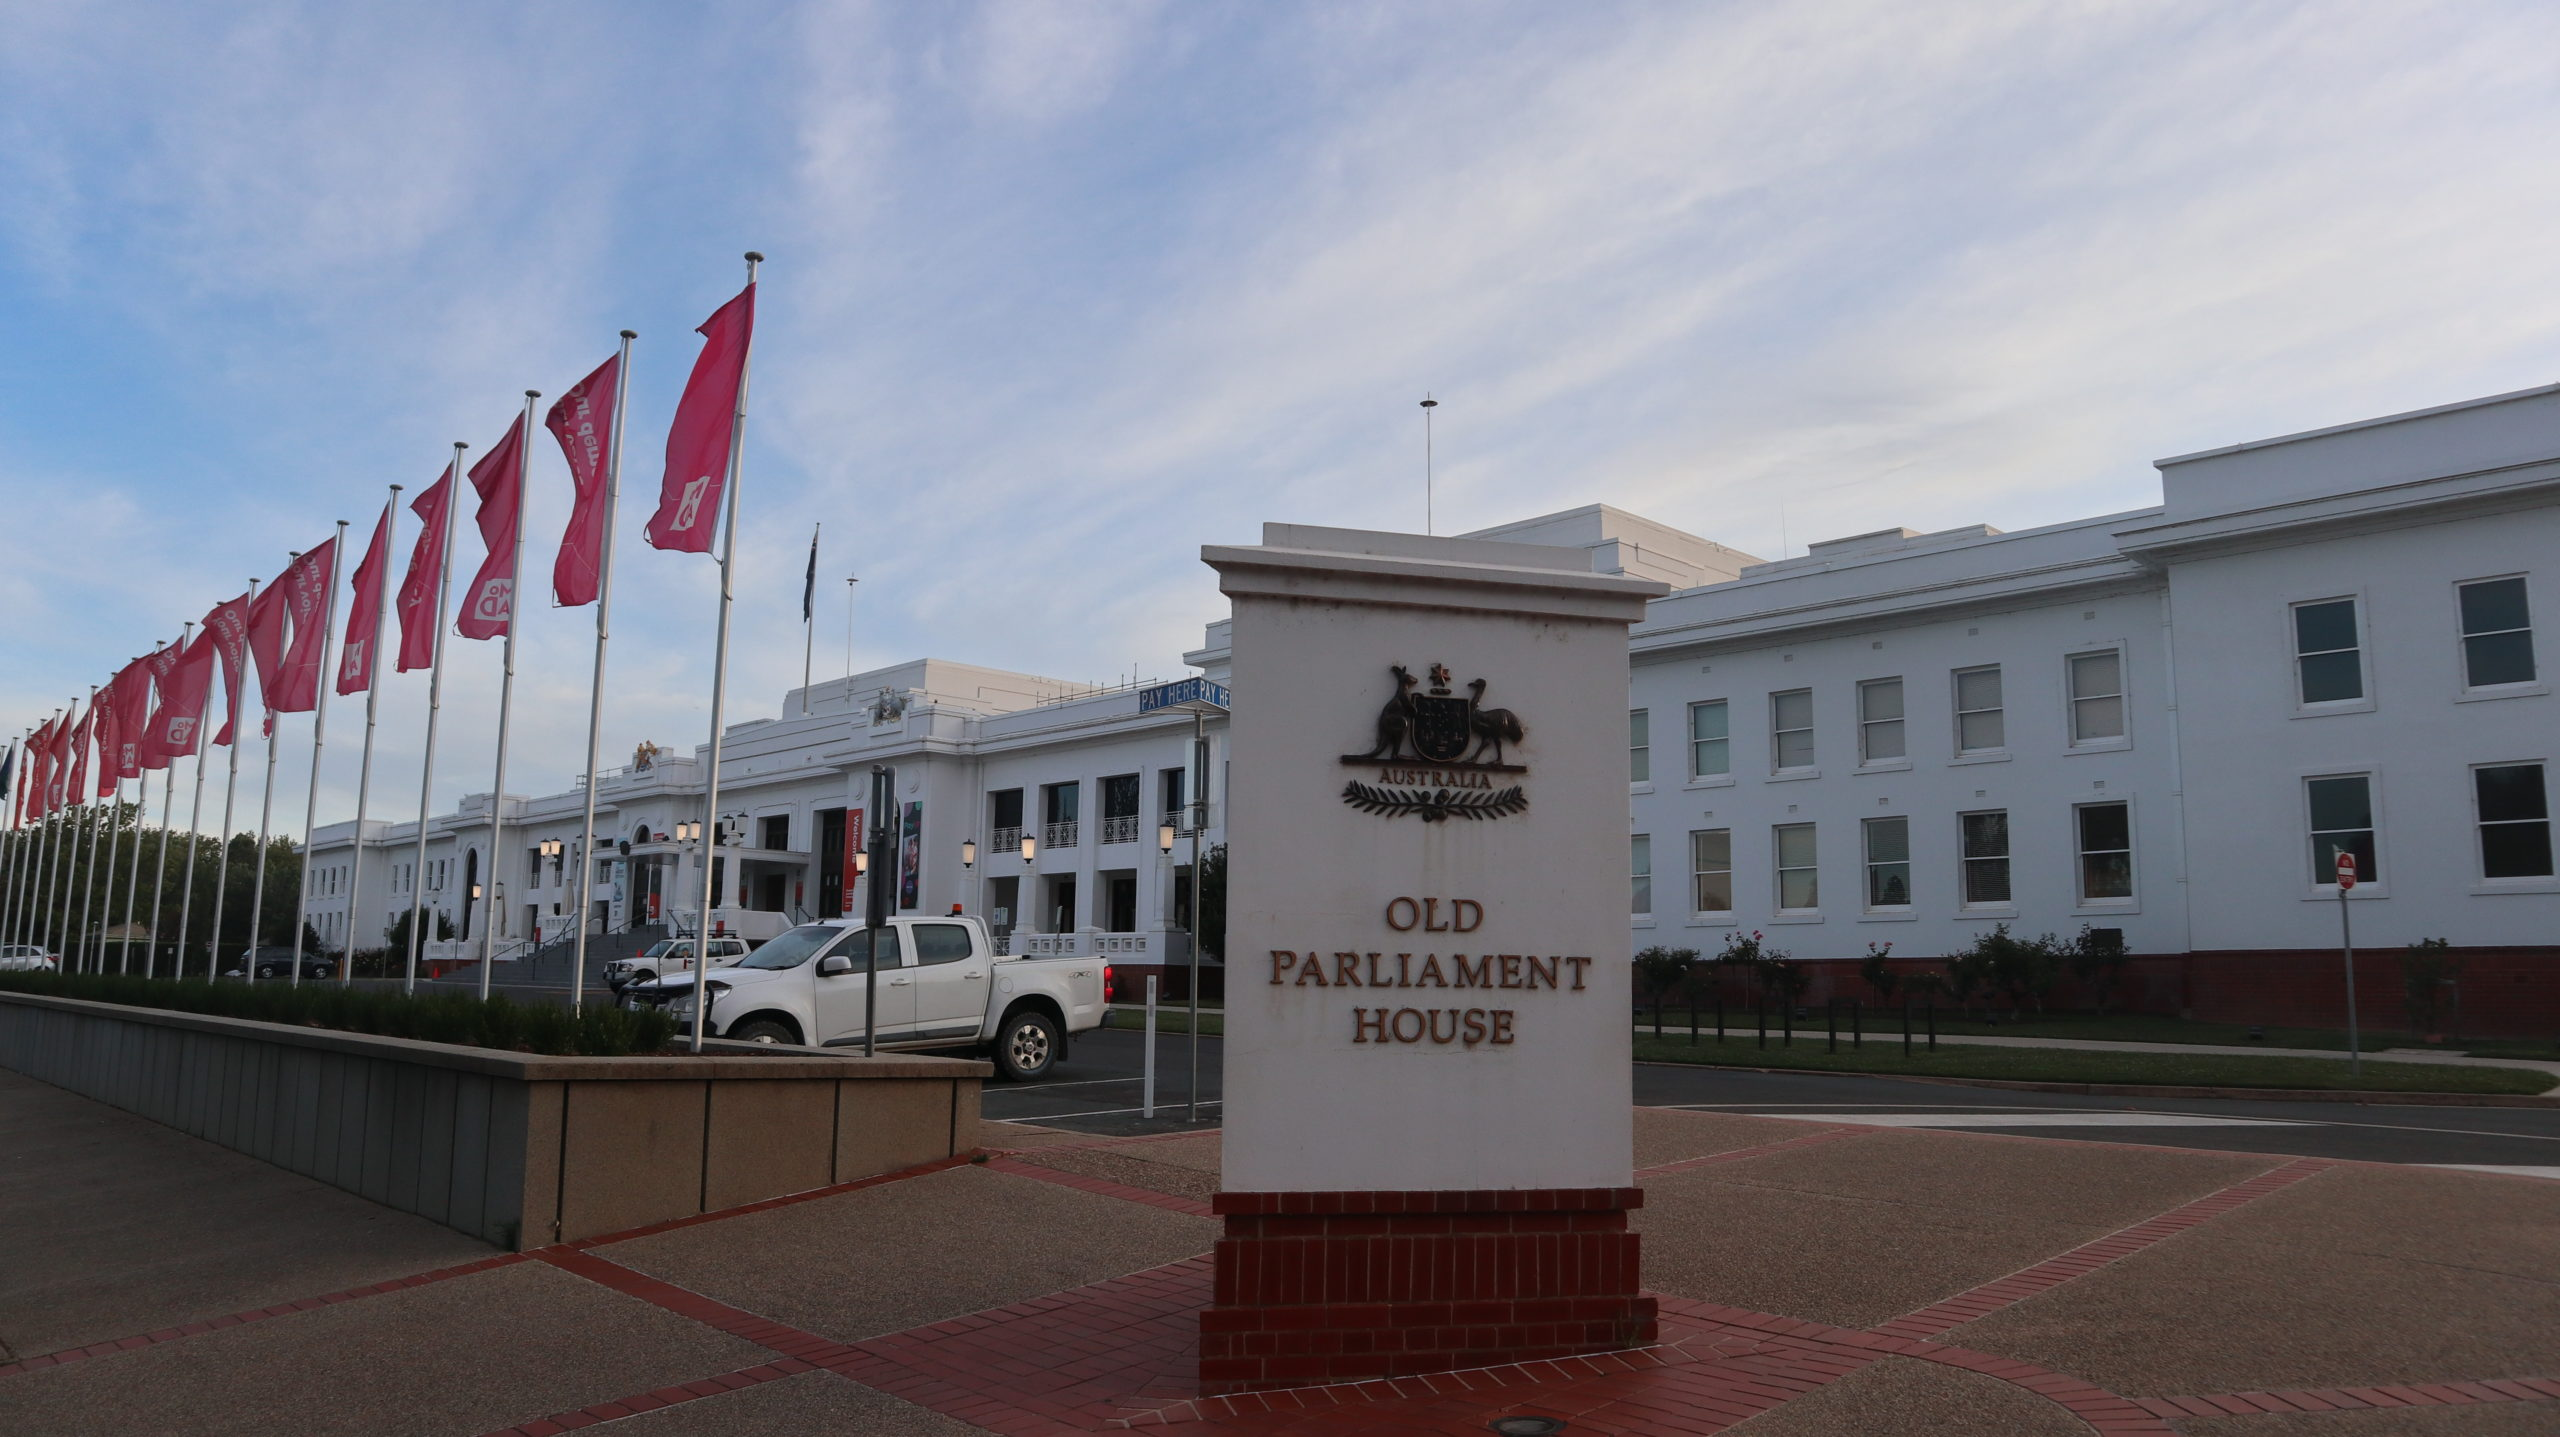 Canberra: Altes Parlament